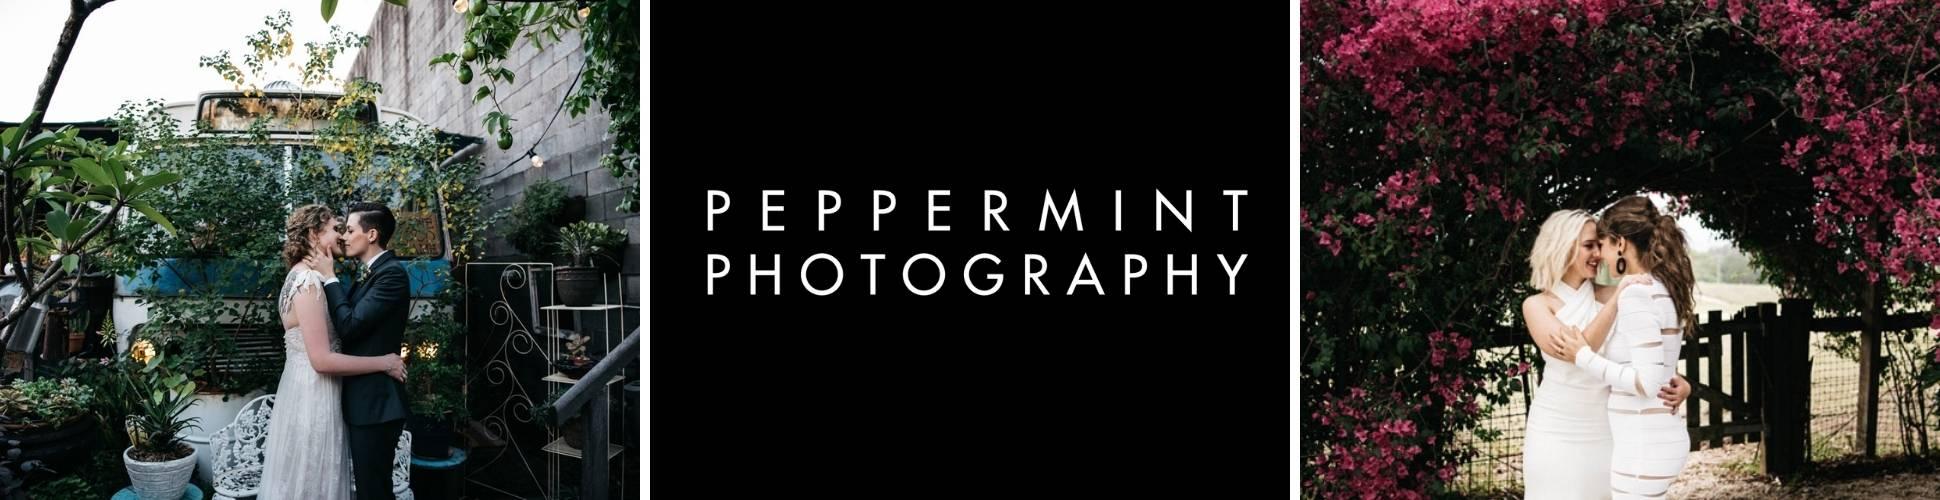 Peppermint Photography Brisbane featured vendor website badge